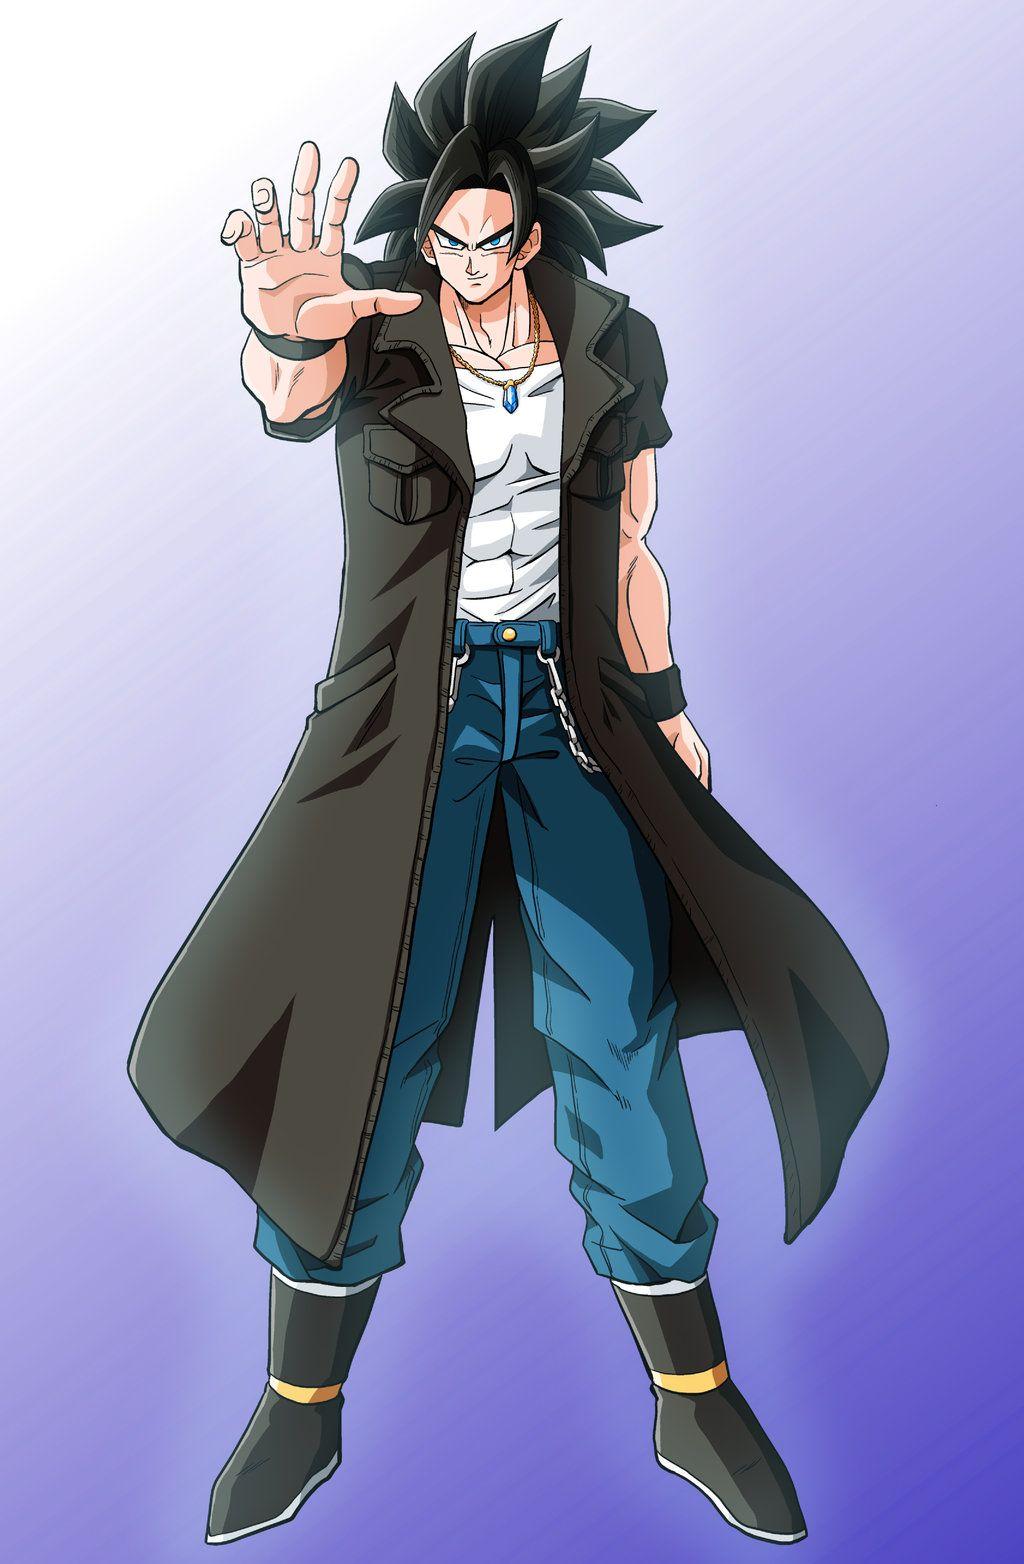 Dragon Ball Z Anime Characters : Request black jacket jack by sasuderuto dragon ball z